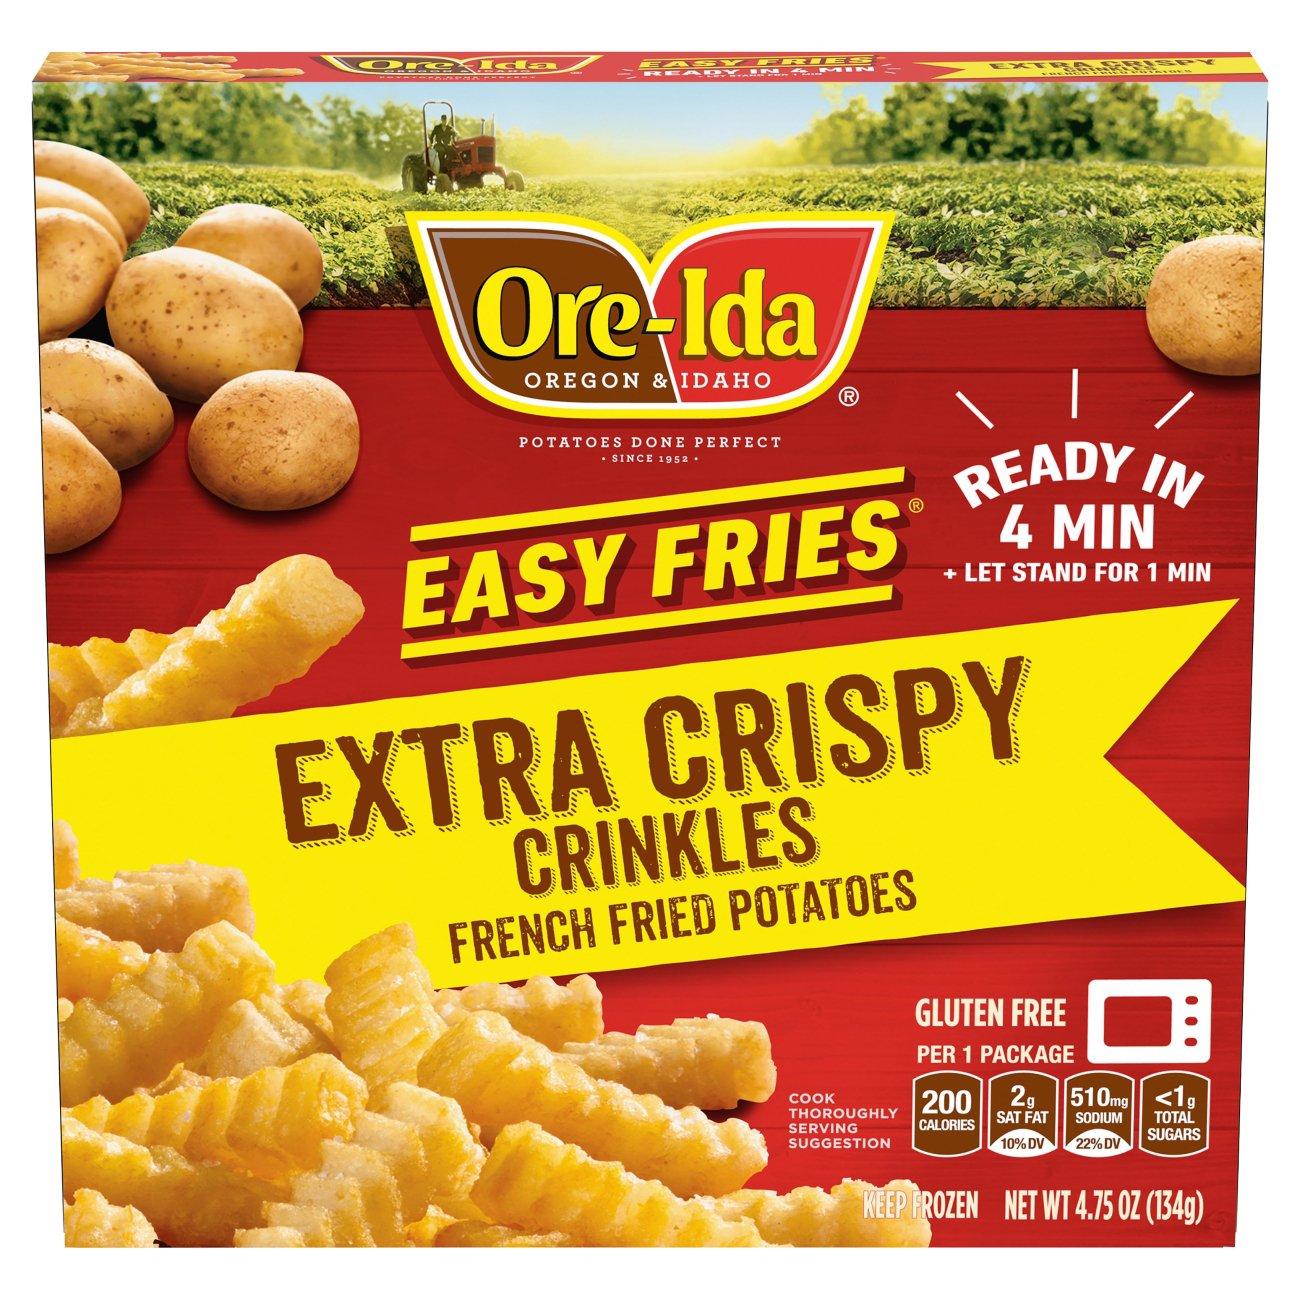 Ore Ida Easy Fries Extra Crispy Golden